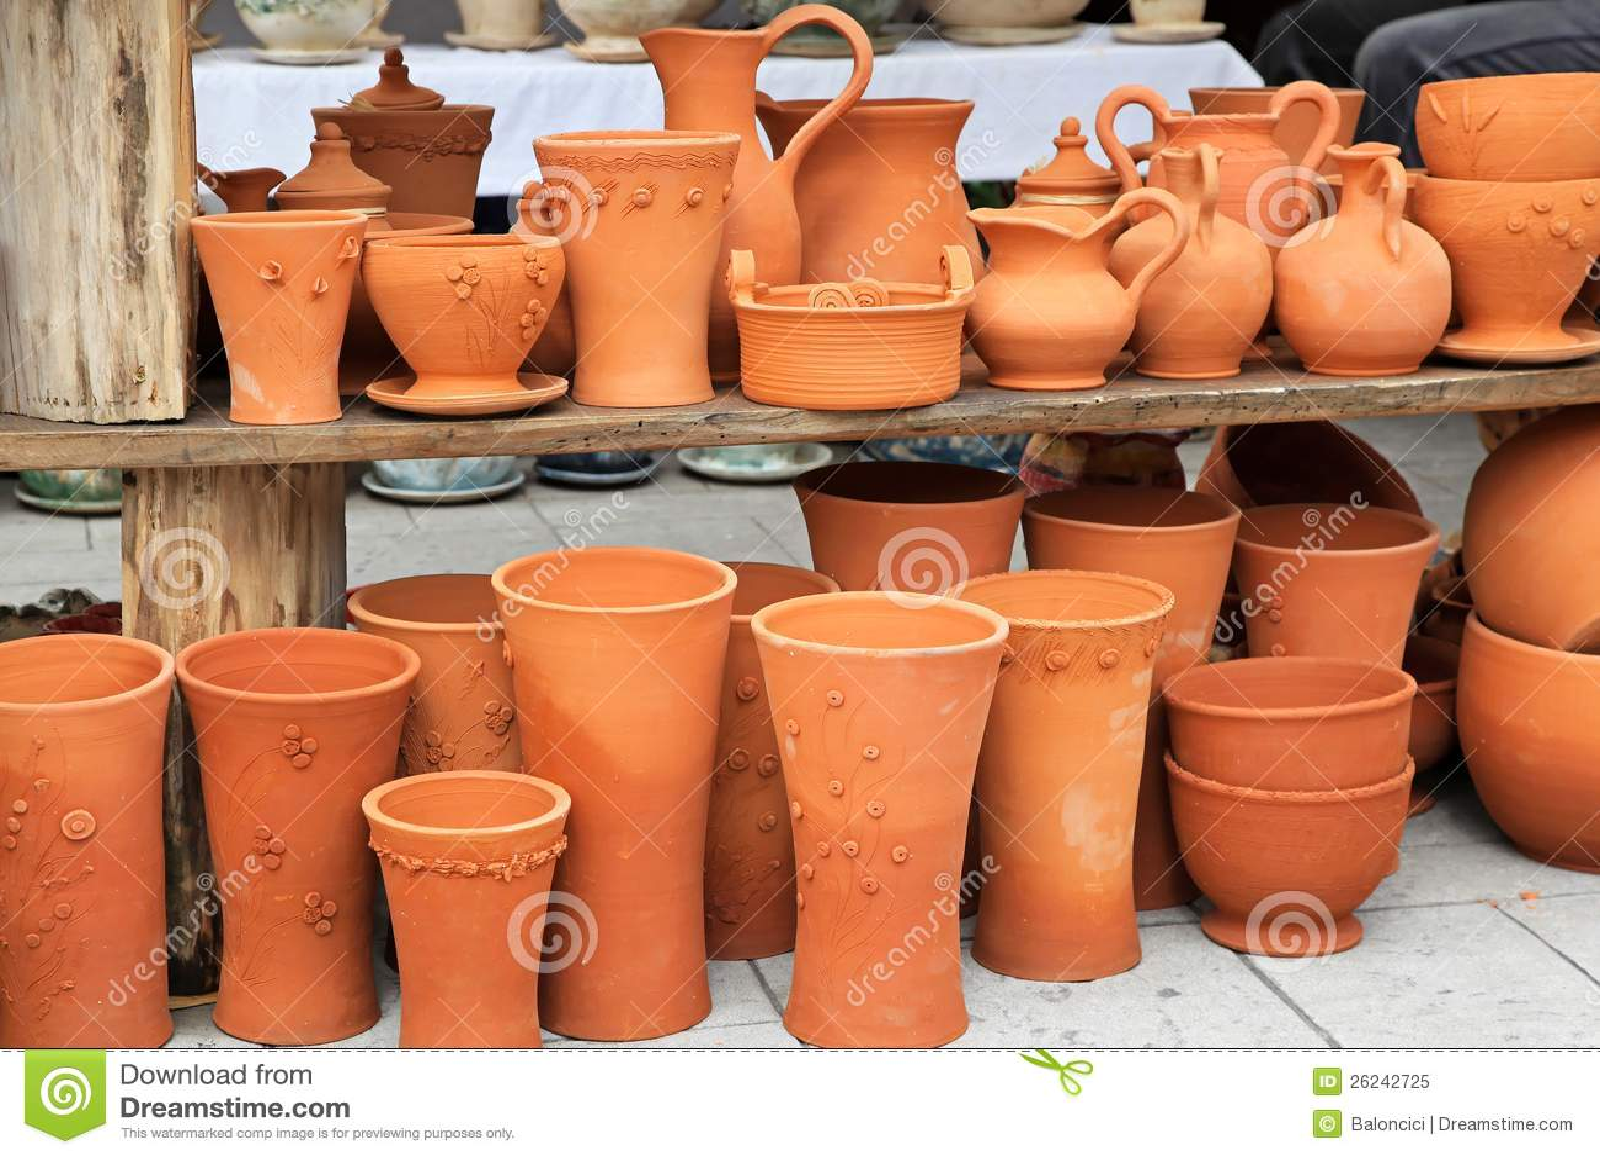 Terracotta Pottery Royalty Free Stock Photo Image 26242725